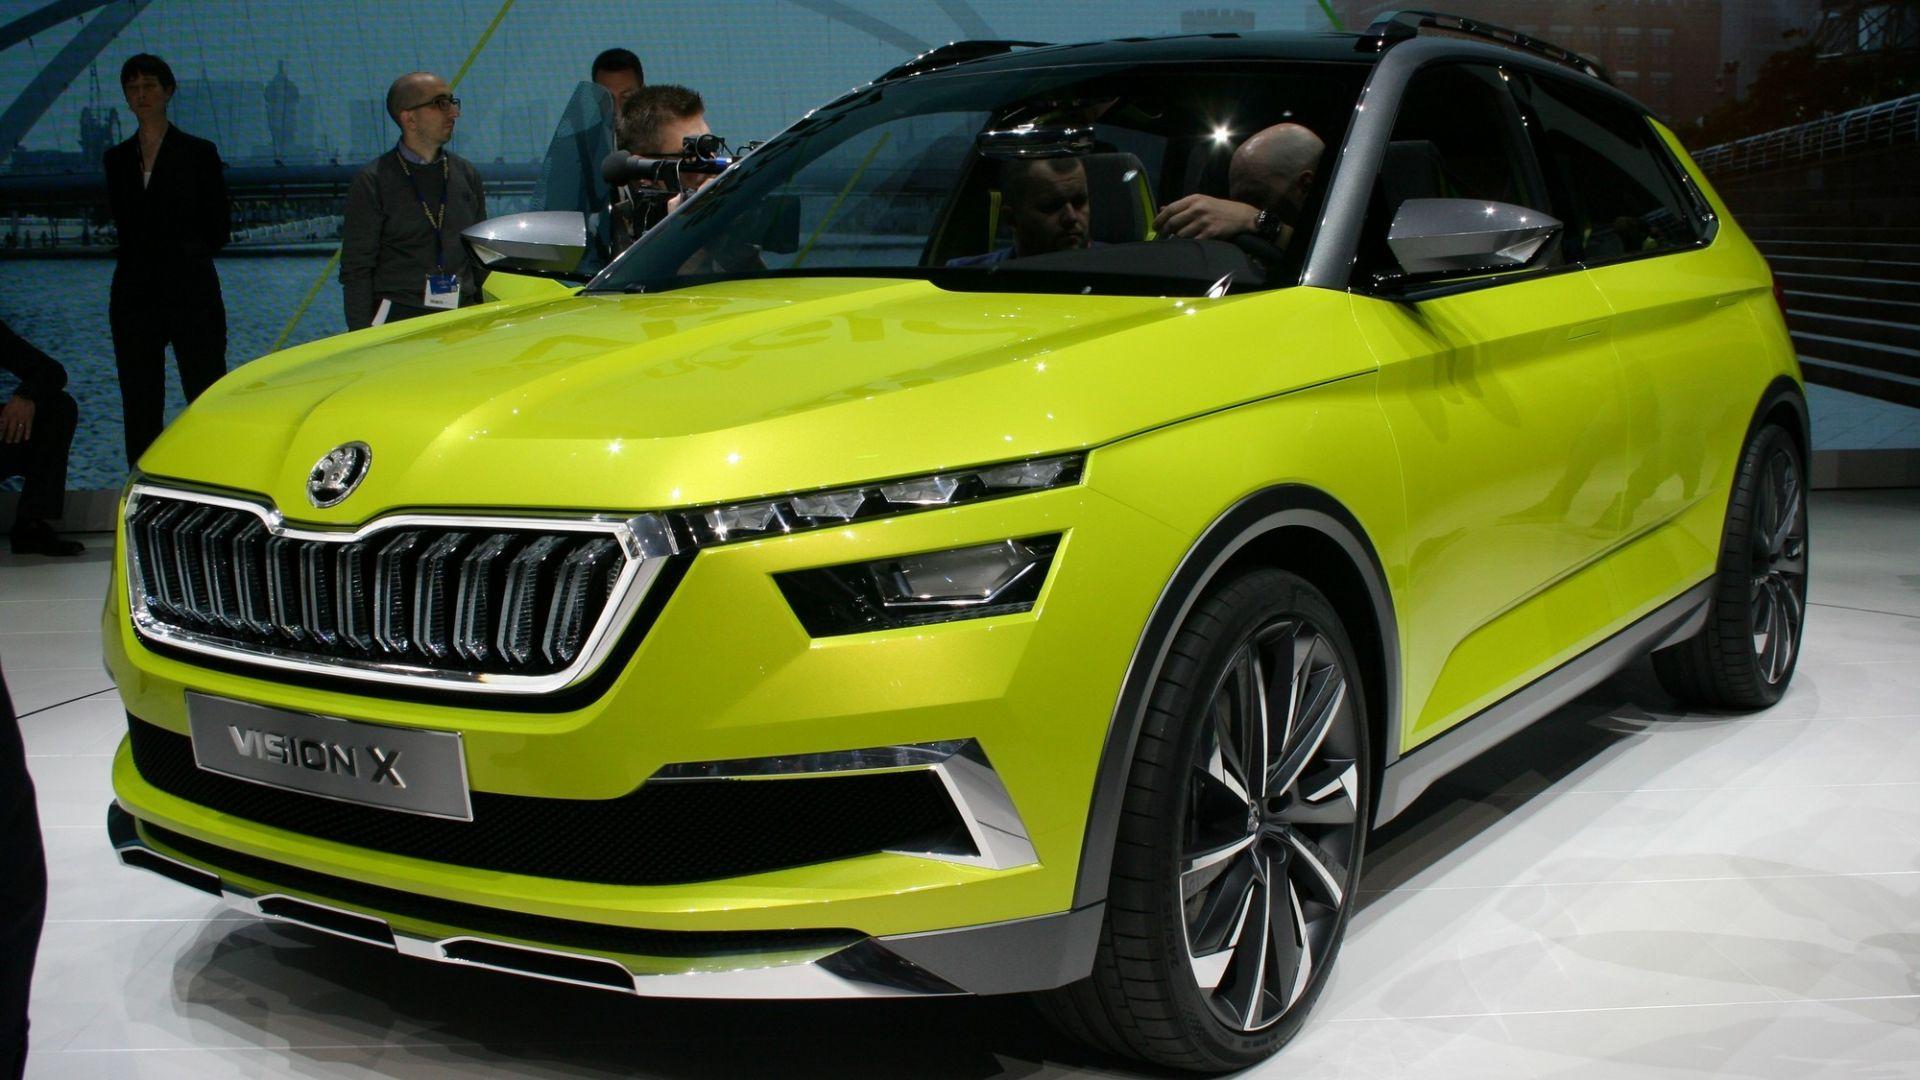 10 novità SUV in arrivo dal Salone di Ginevra 2018 - MotorBox